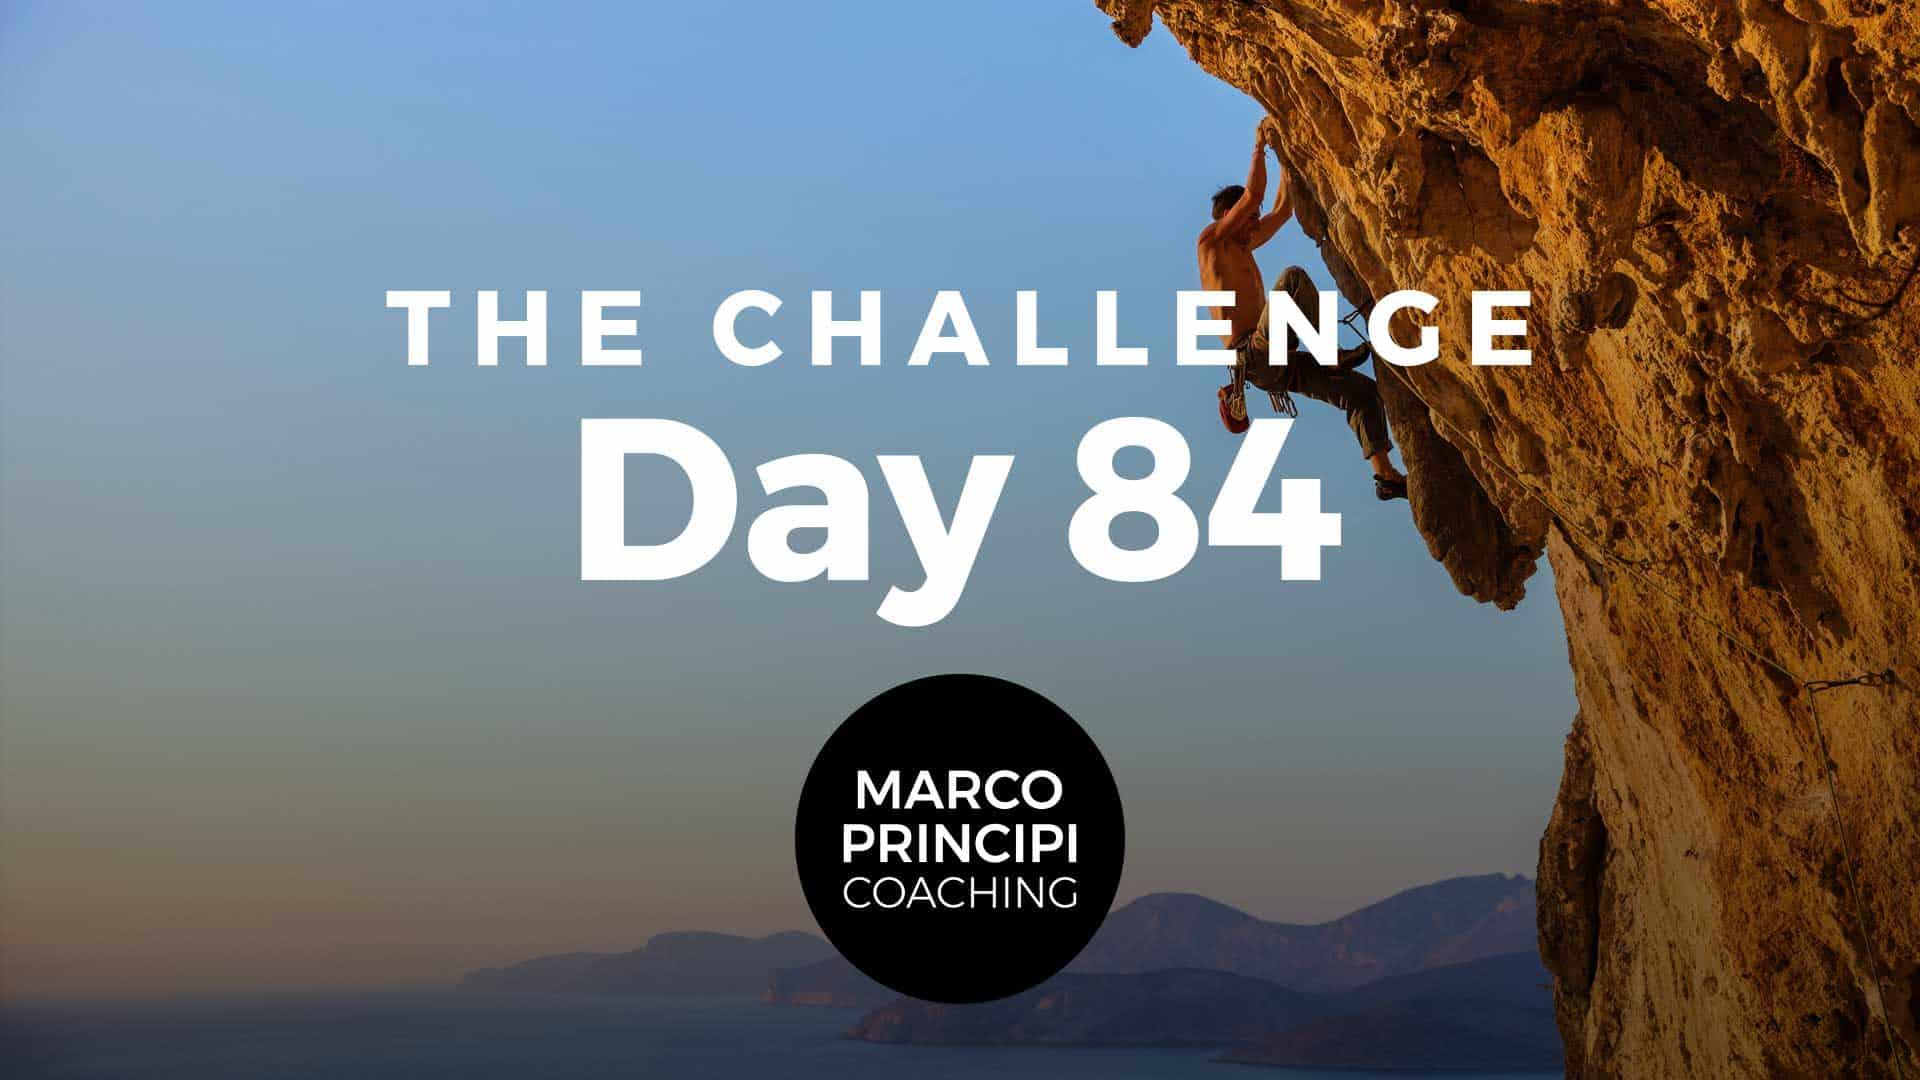 Marco Principi Coaching Challenge Day 84